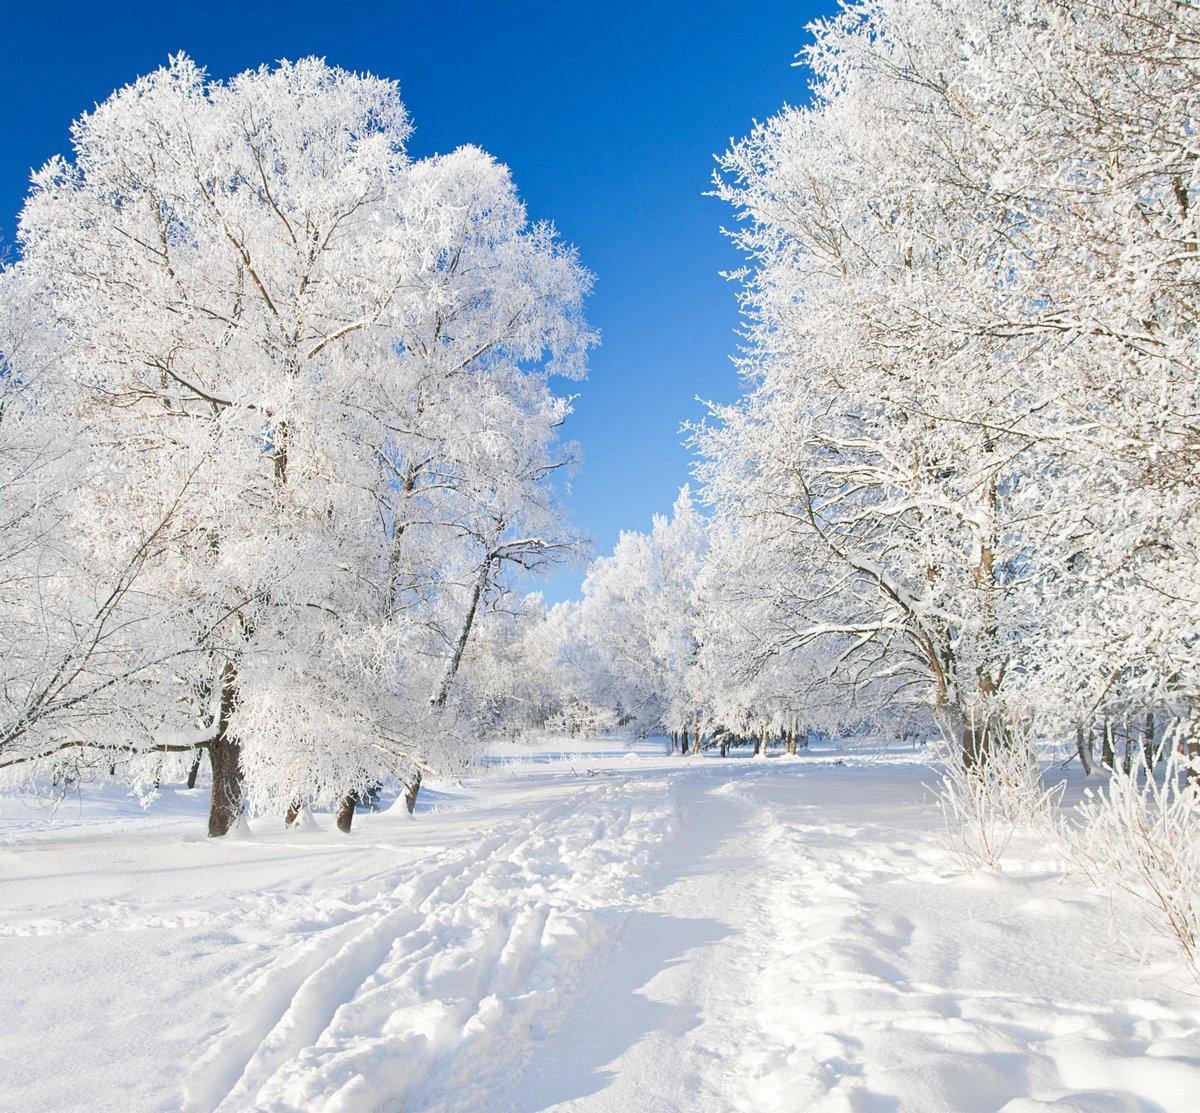 "Постер Зима ""Зимний парк в снегу"" от Artwall"